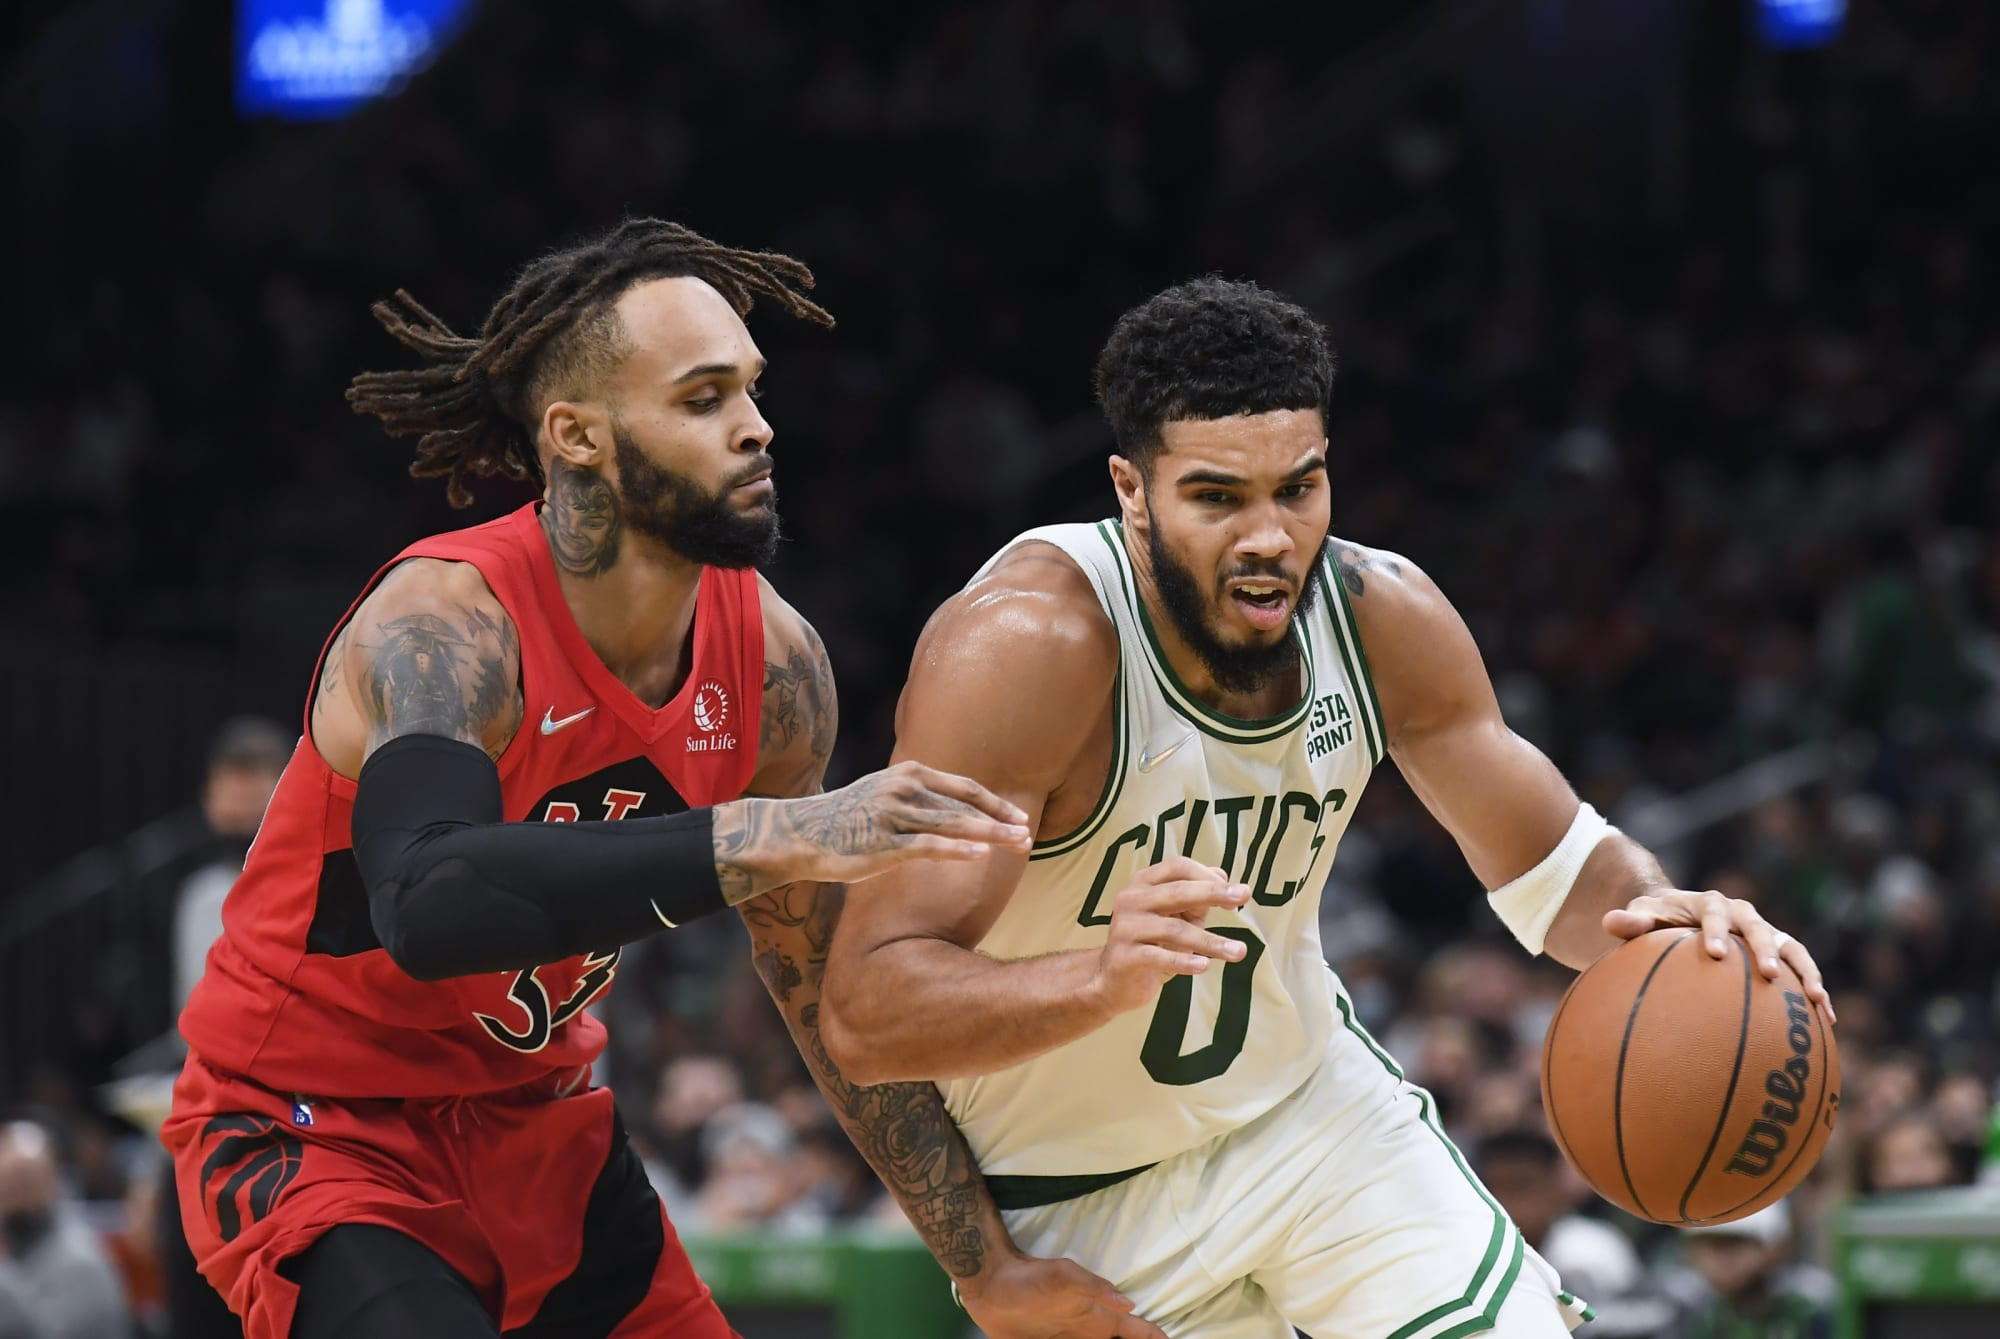 Raptors Game Tonight: Raptors vs Celtics Odds, Starting Lineup, Injury Report, Predictions, TV Channel for Oct. 22